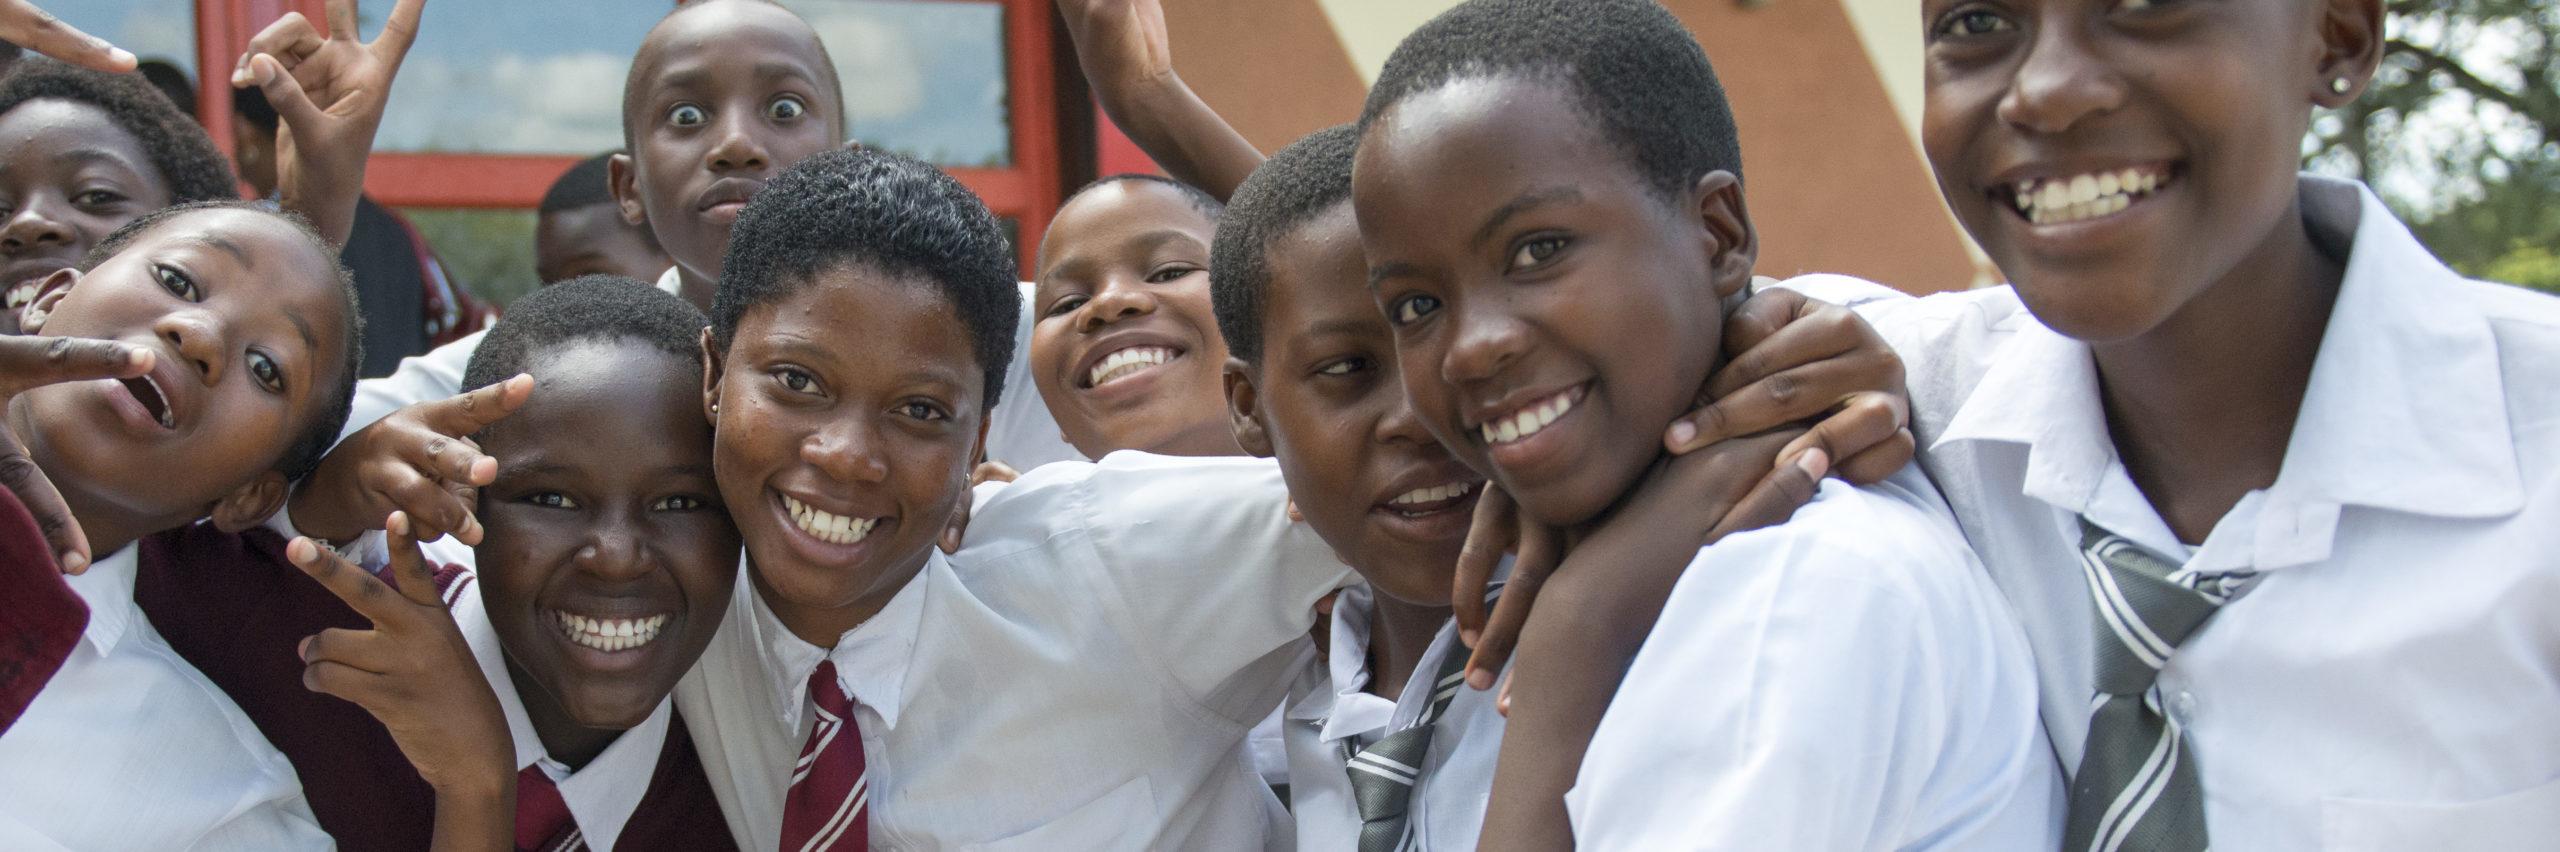 PEPFAR Supported School Girls In Botswana